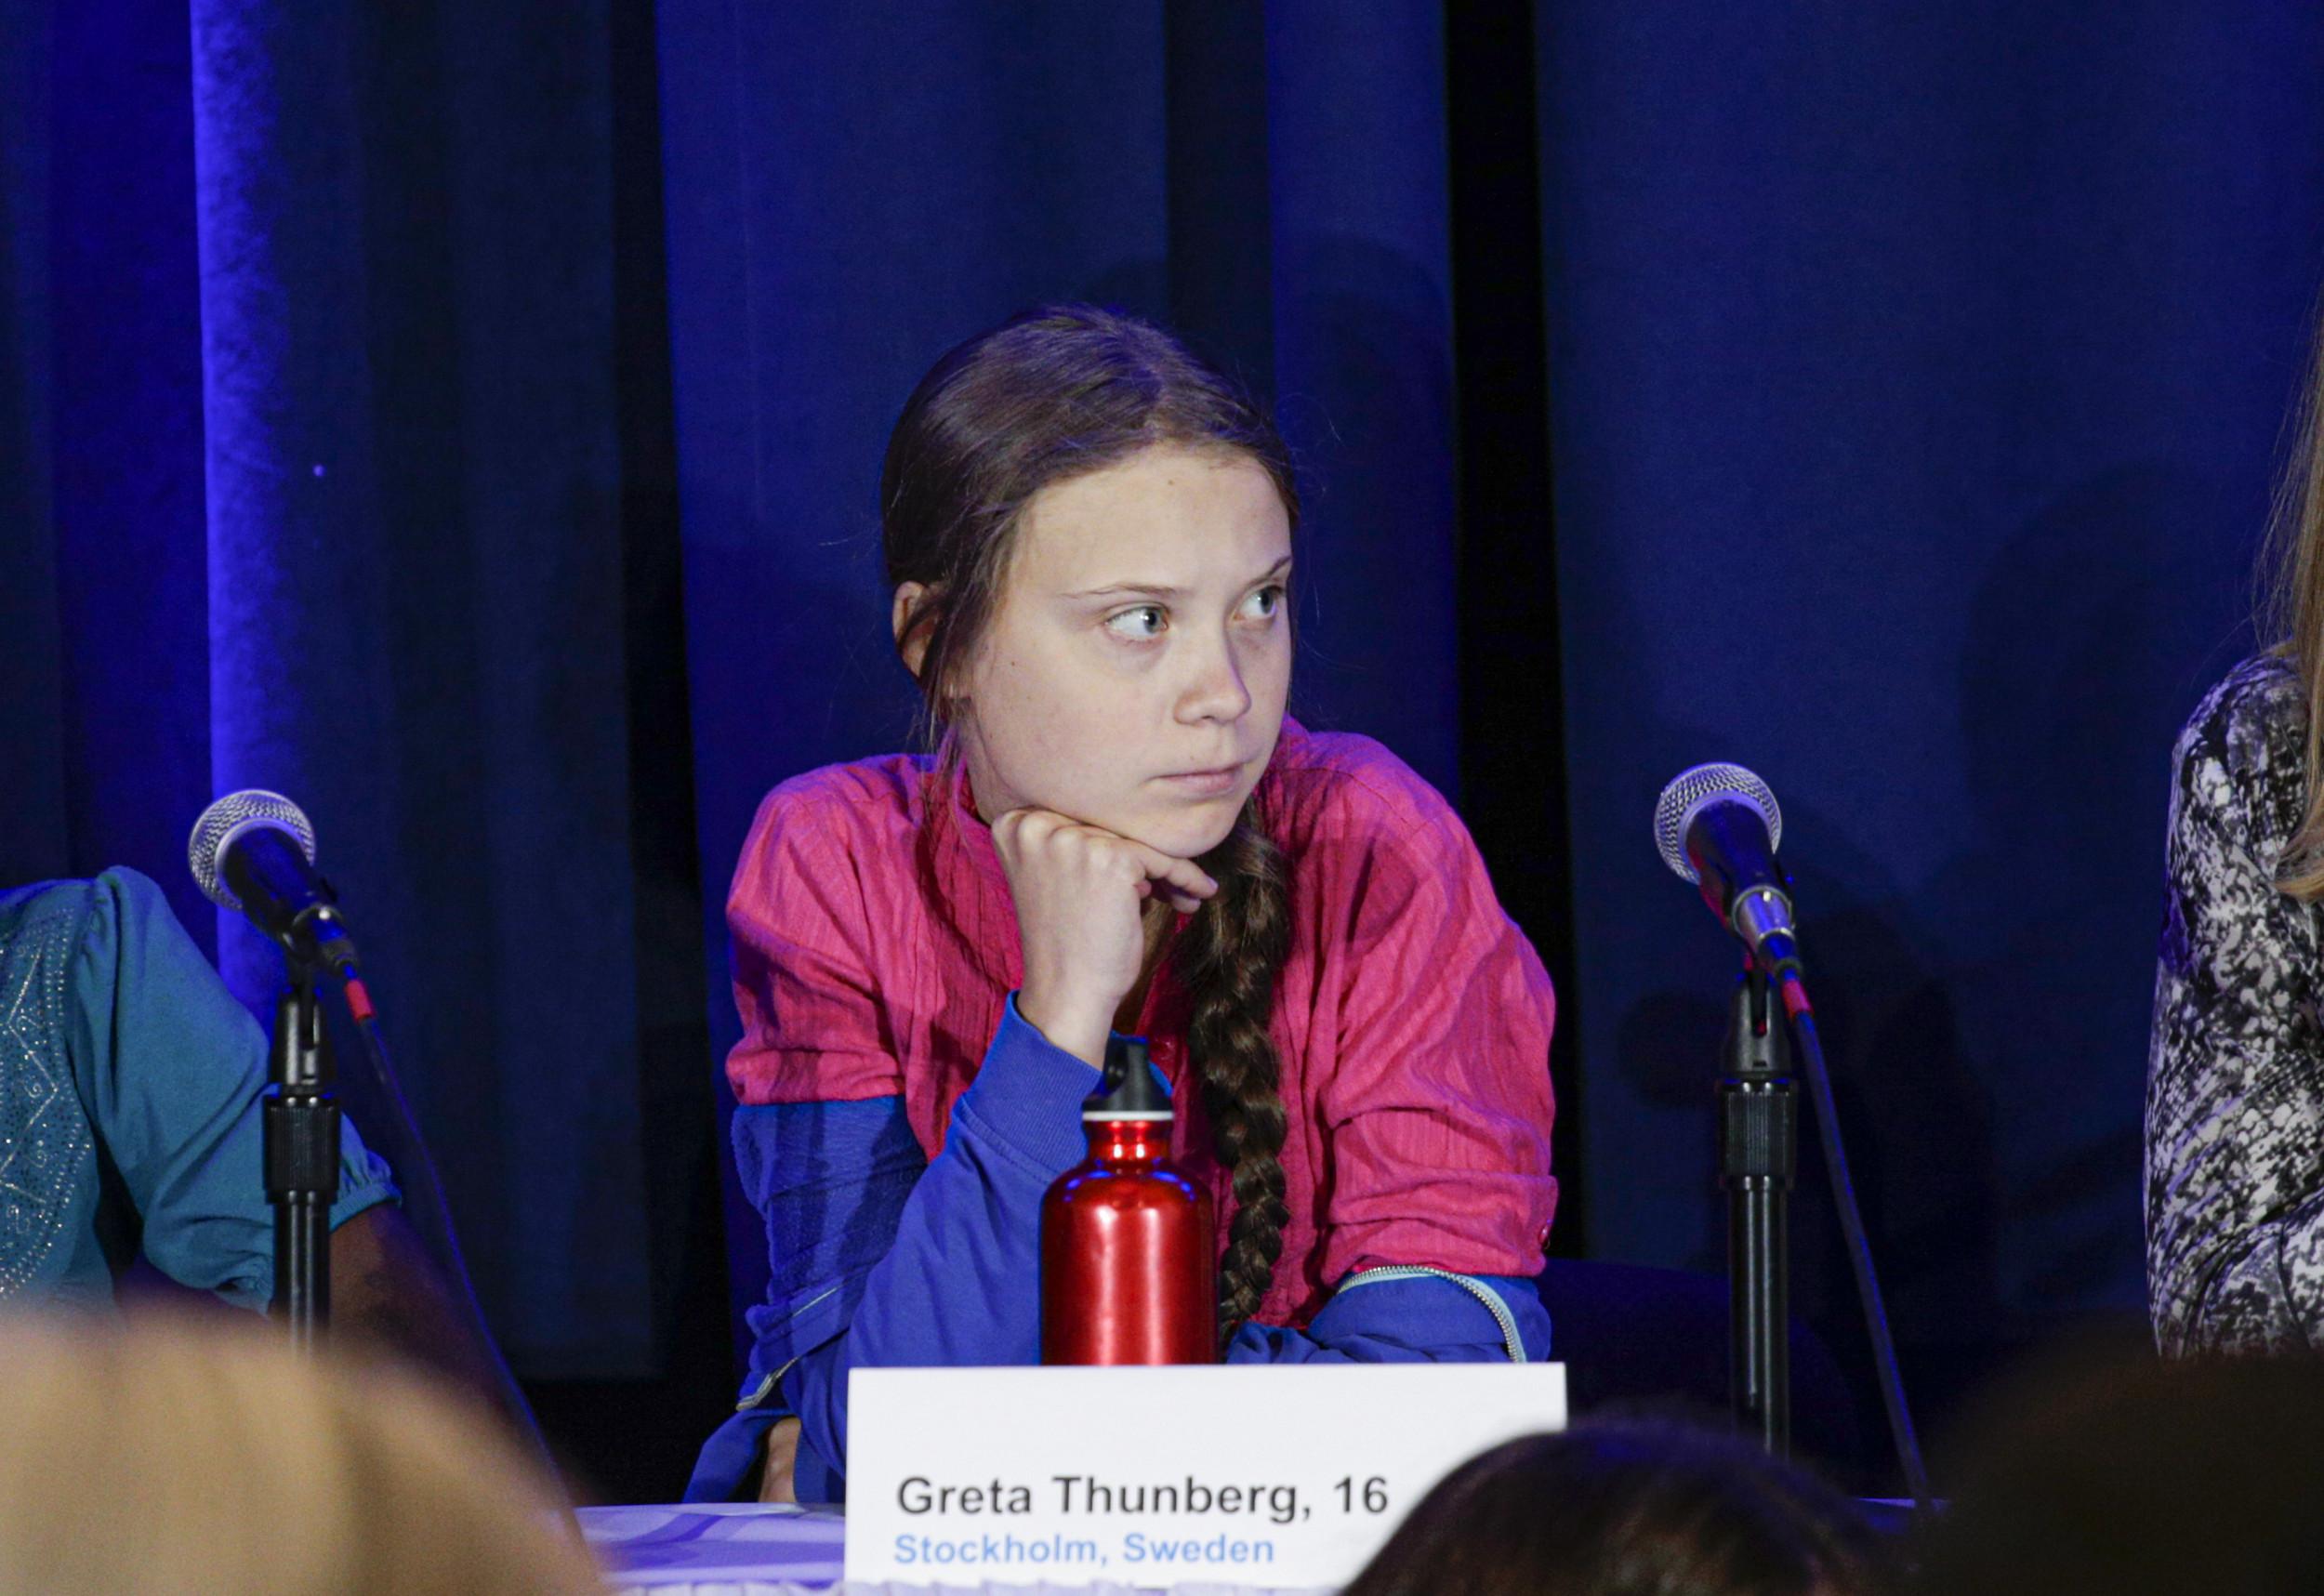 Melania Trump's anti-bullying slogan #BeBest trends after Donald Trump mocks 16-year-old climate activist Greta Thunberg